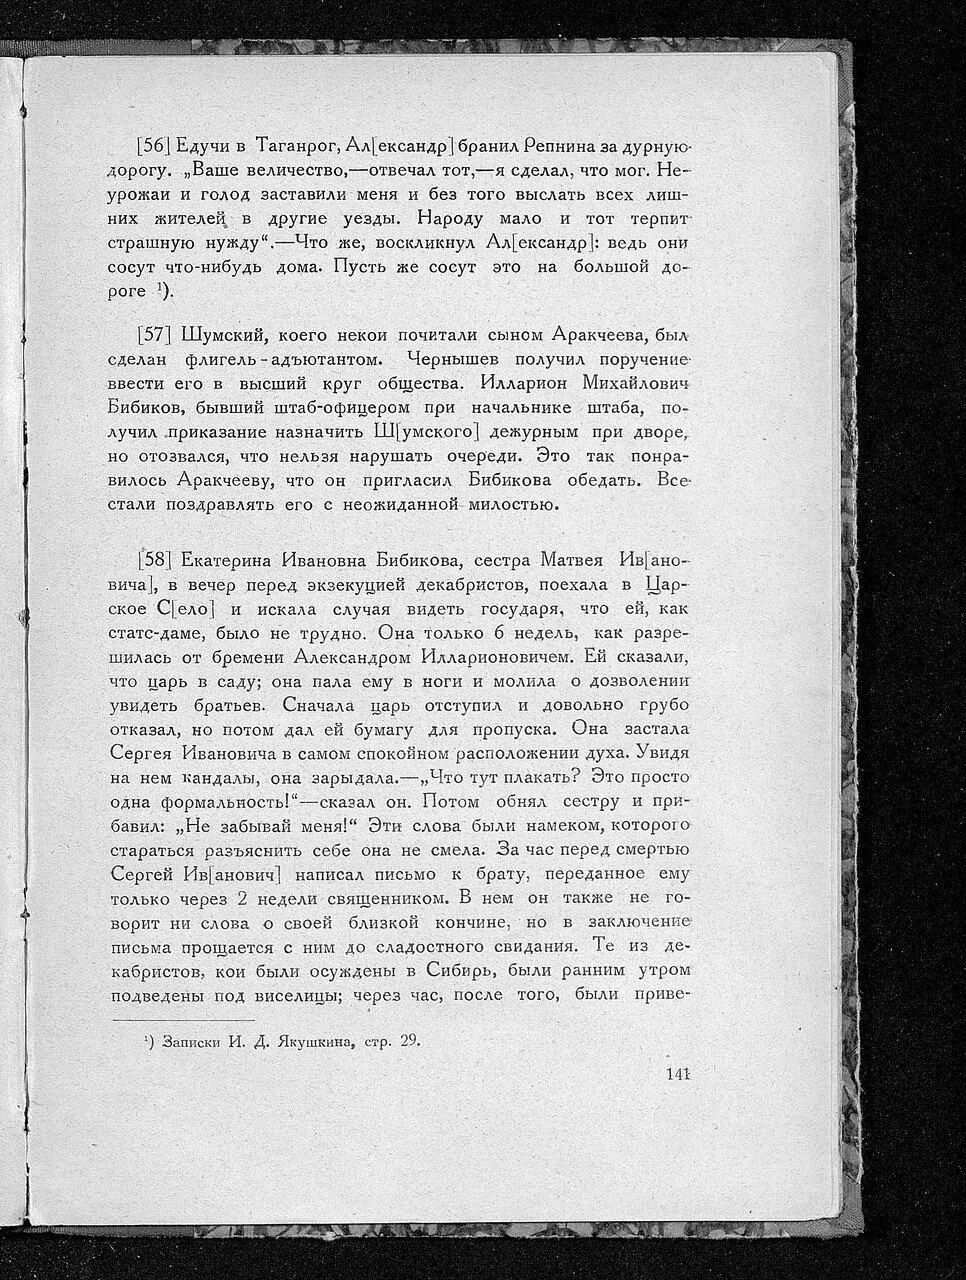 https://img-fotki.yandex.ru/get/931298/199368979.a2/0_214386_4136c6a1_XXXL.jpg